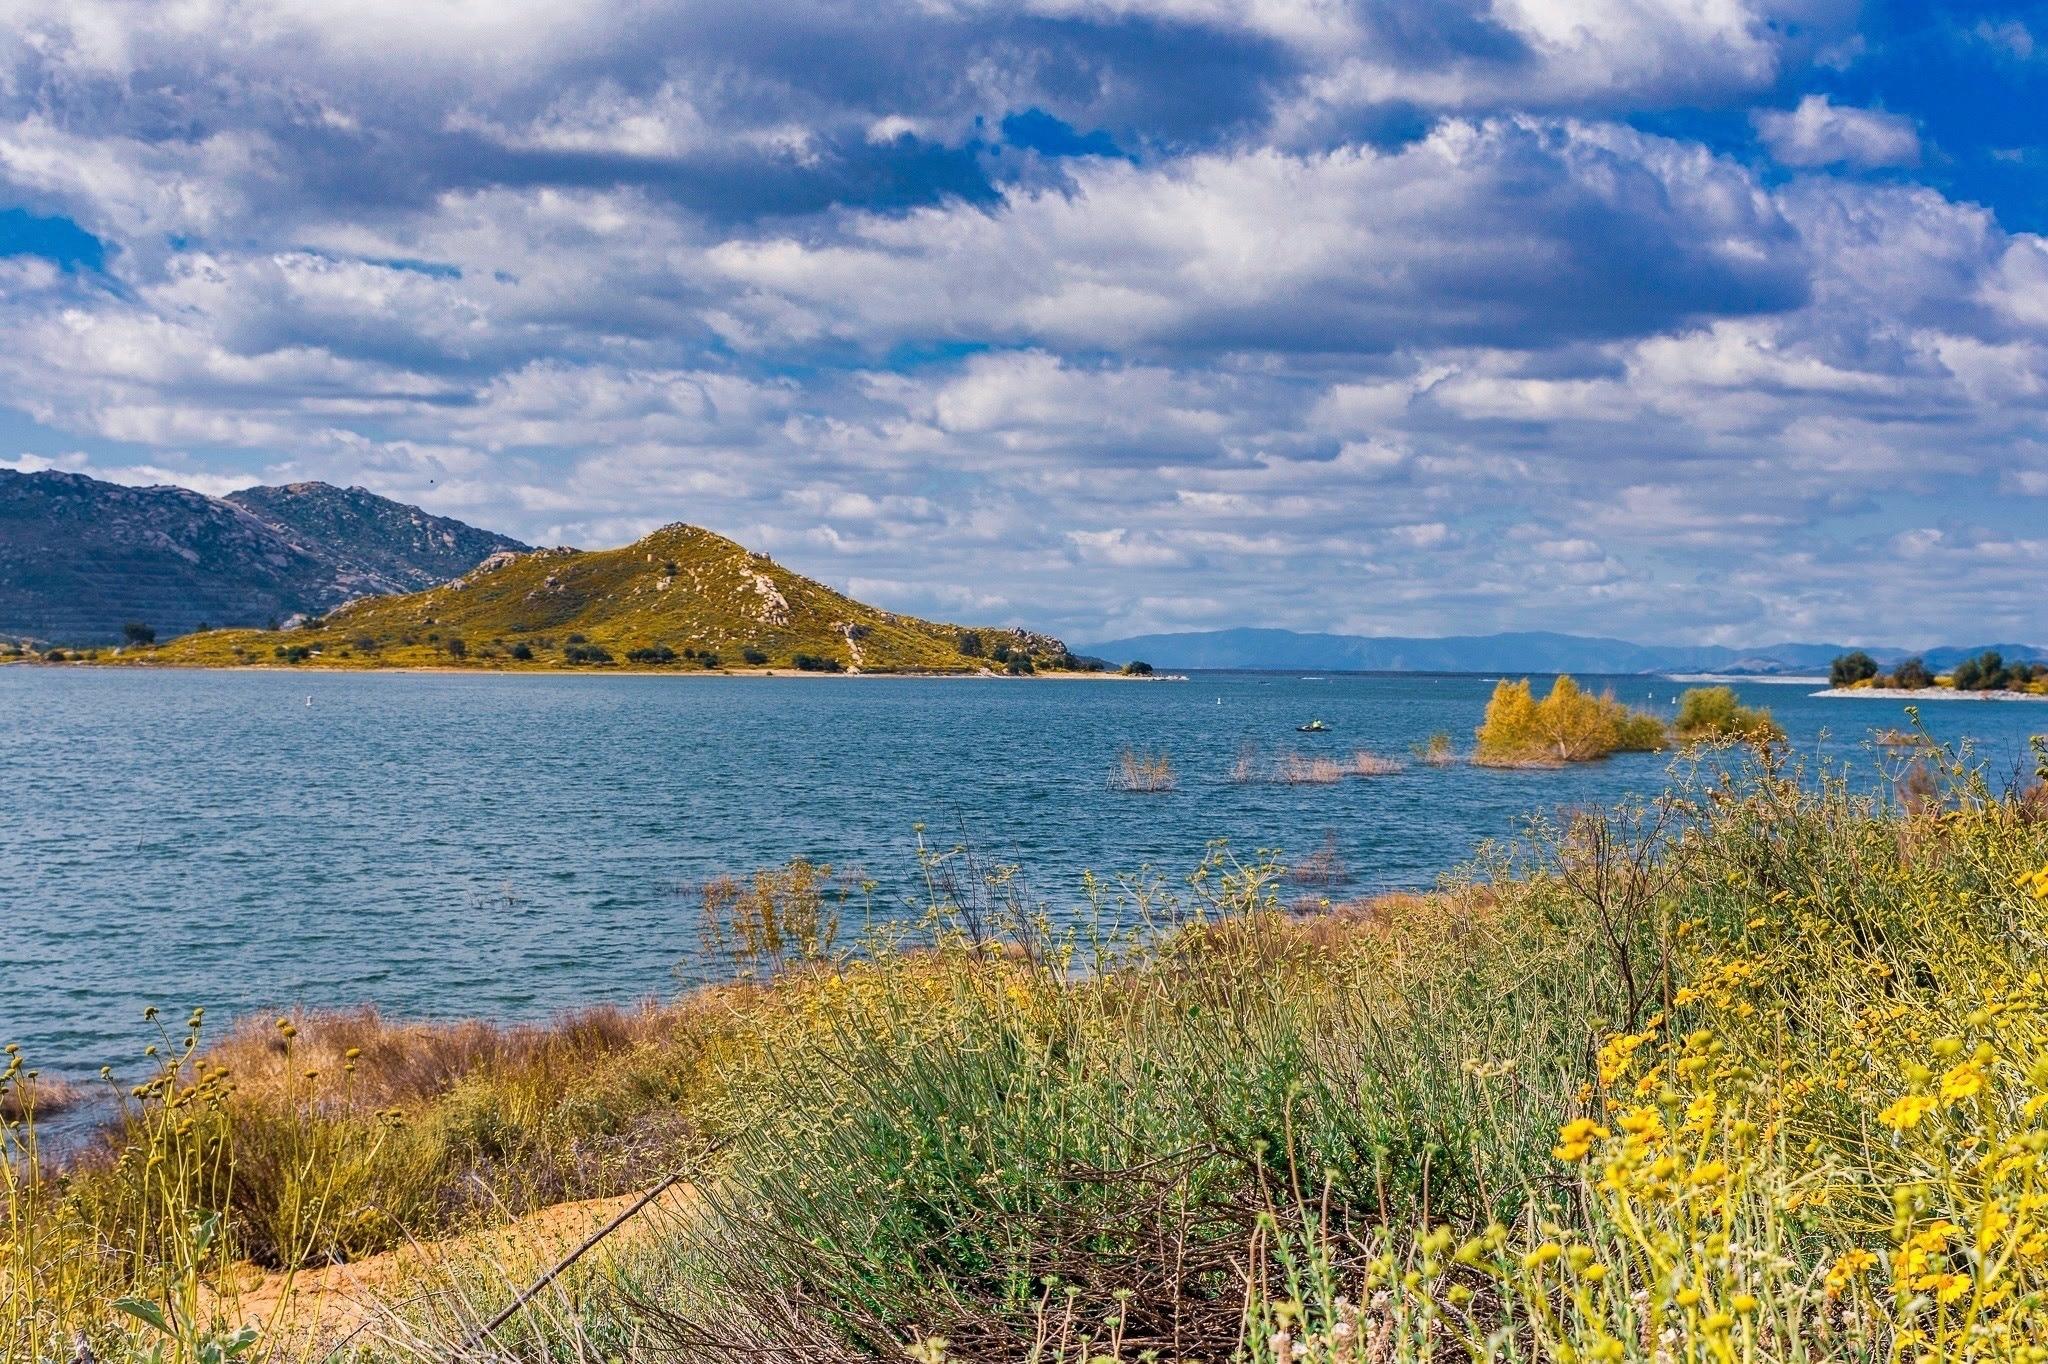 Moreno Valley, California, United States of America